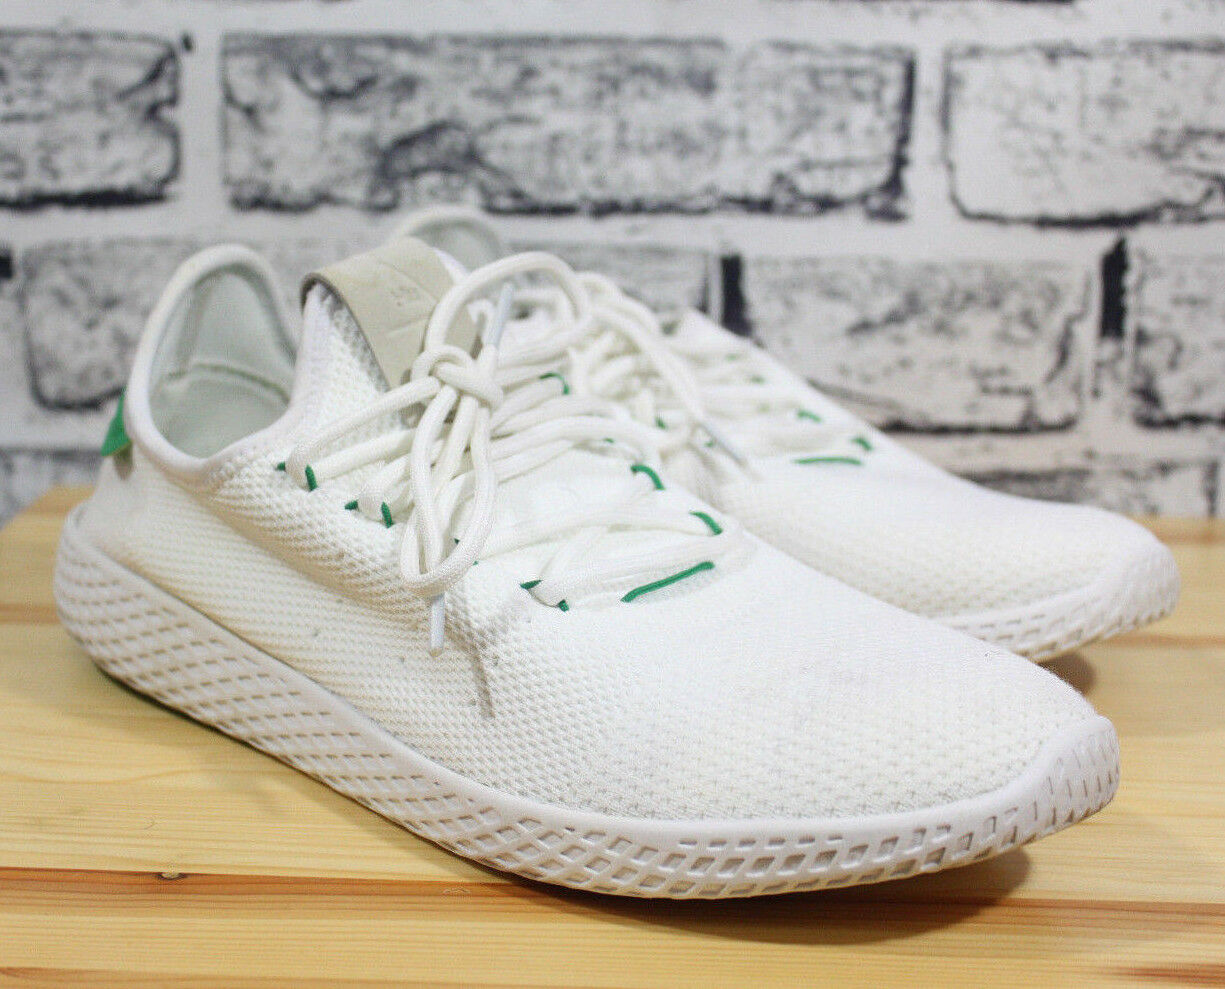 Adidas Originals Pharrell Williams Tennis Human Race shoes Mens BA7828 White 10